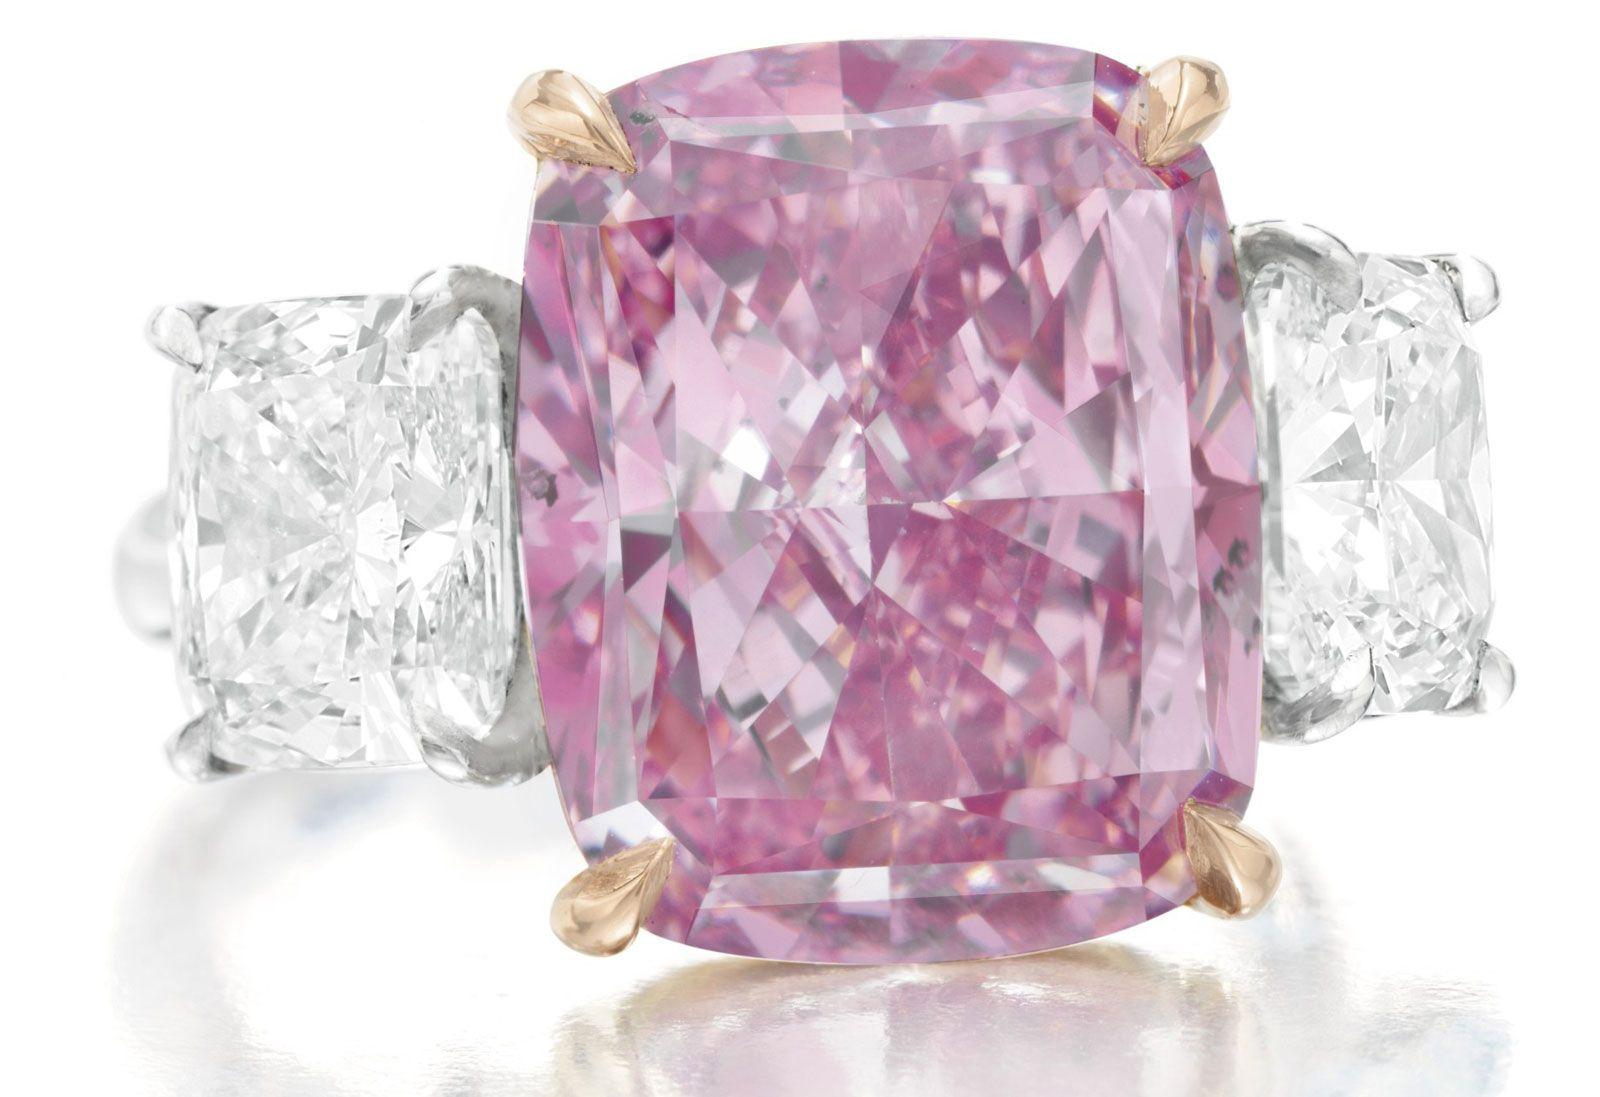 10.09 ct. Fancy Vivid purplish-pink cushion cut diamond, expected to ...